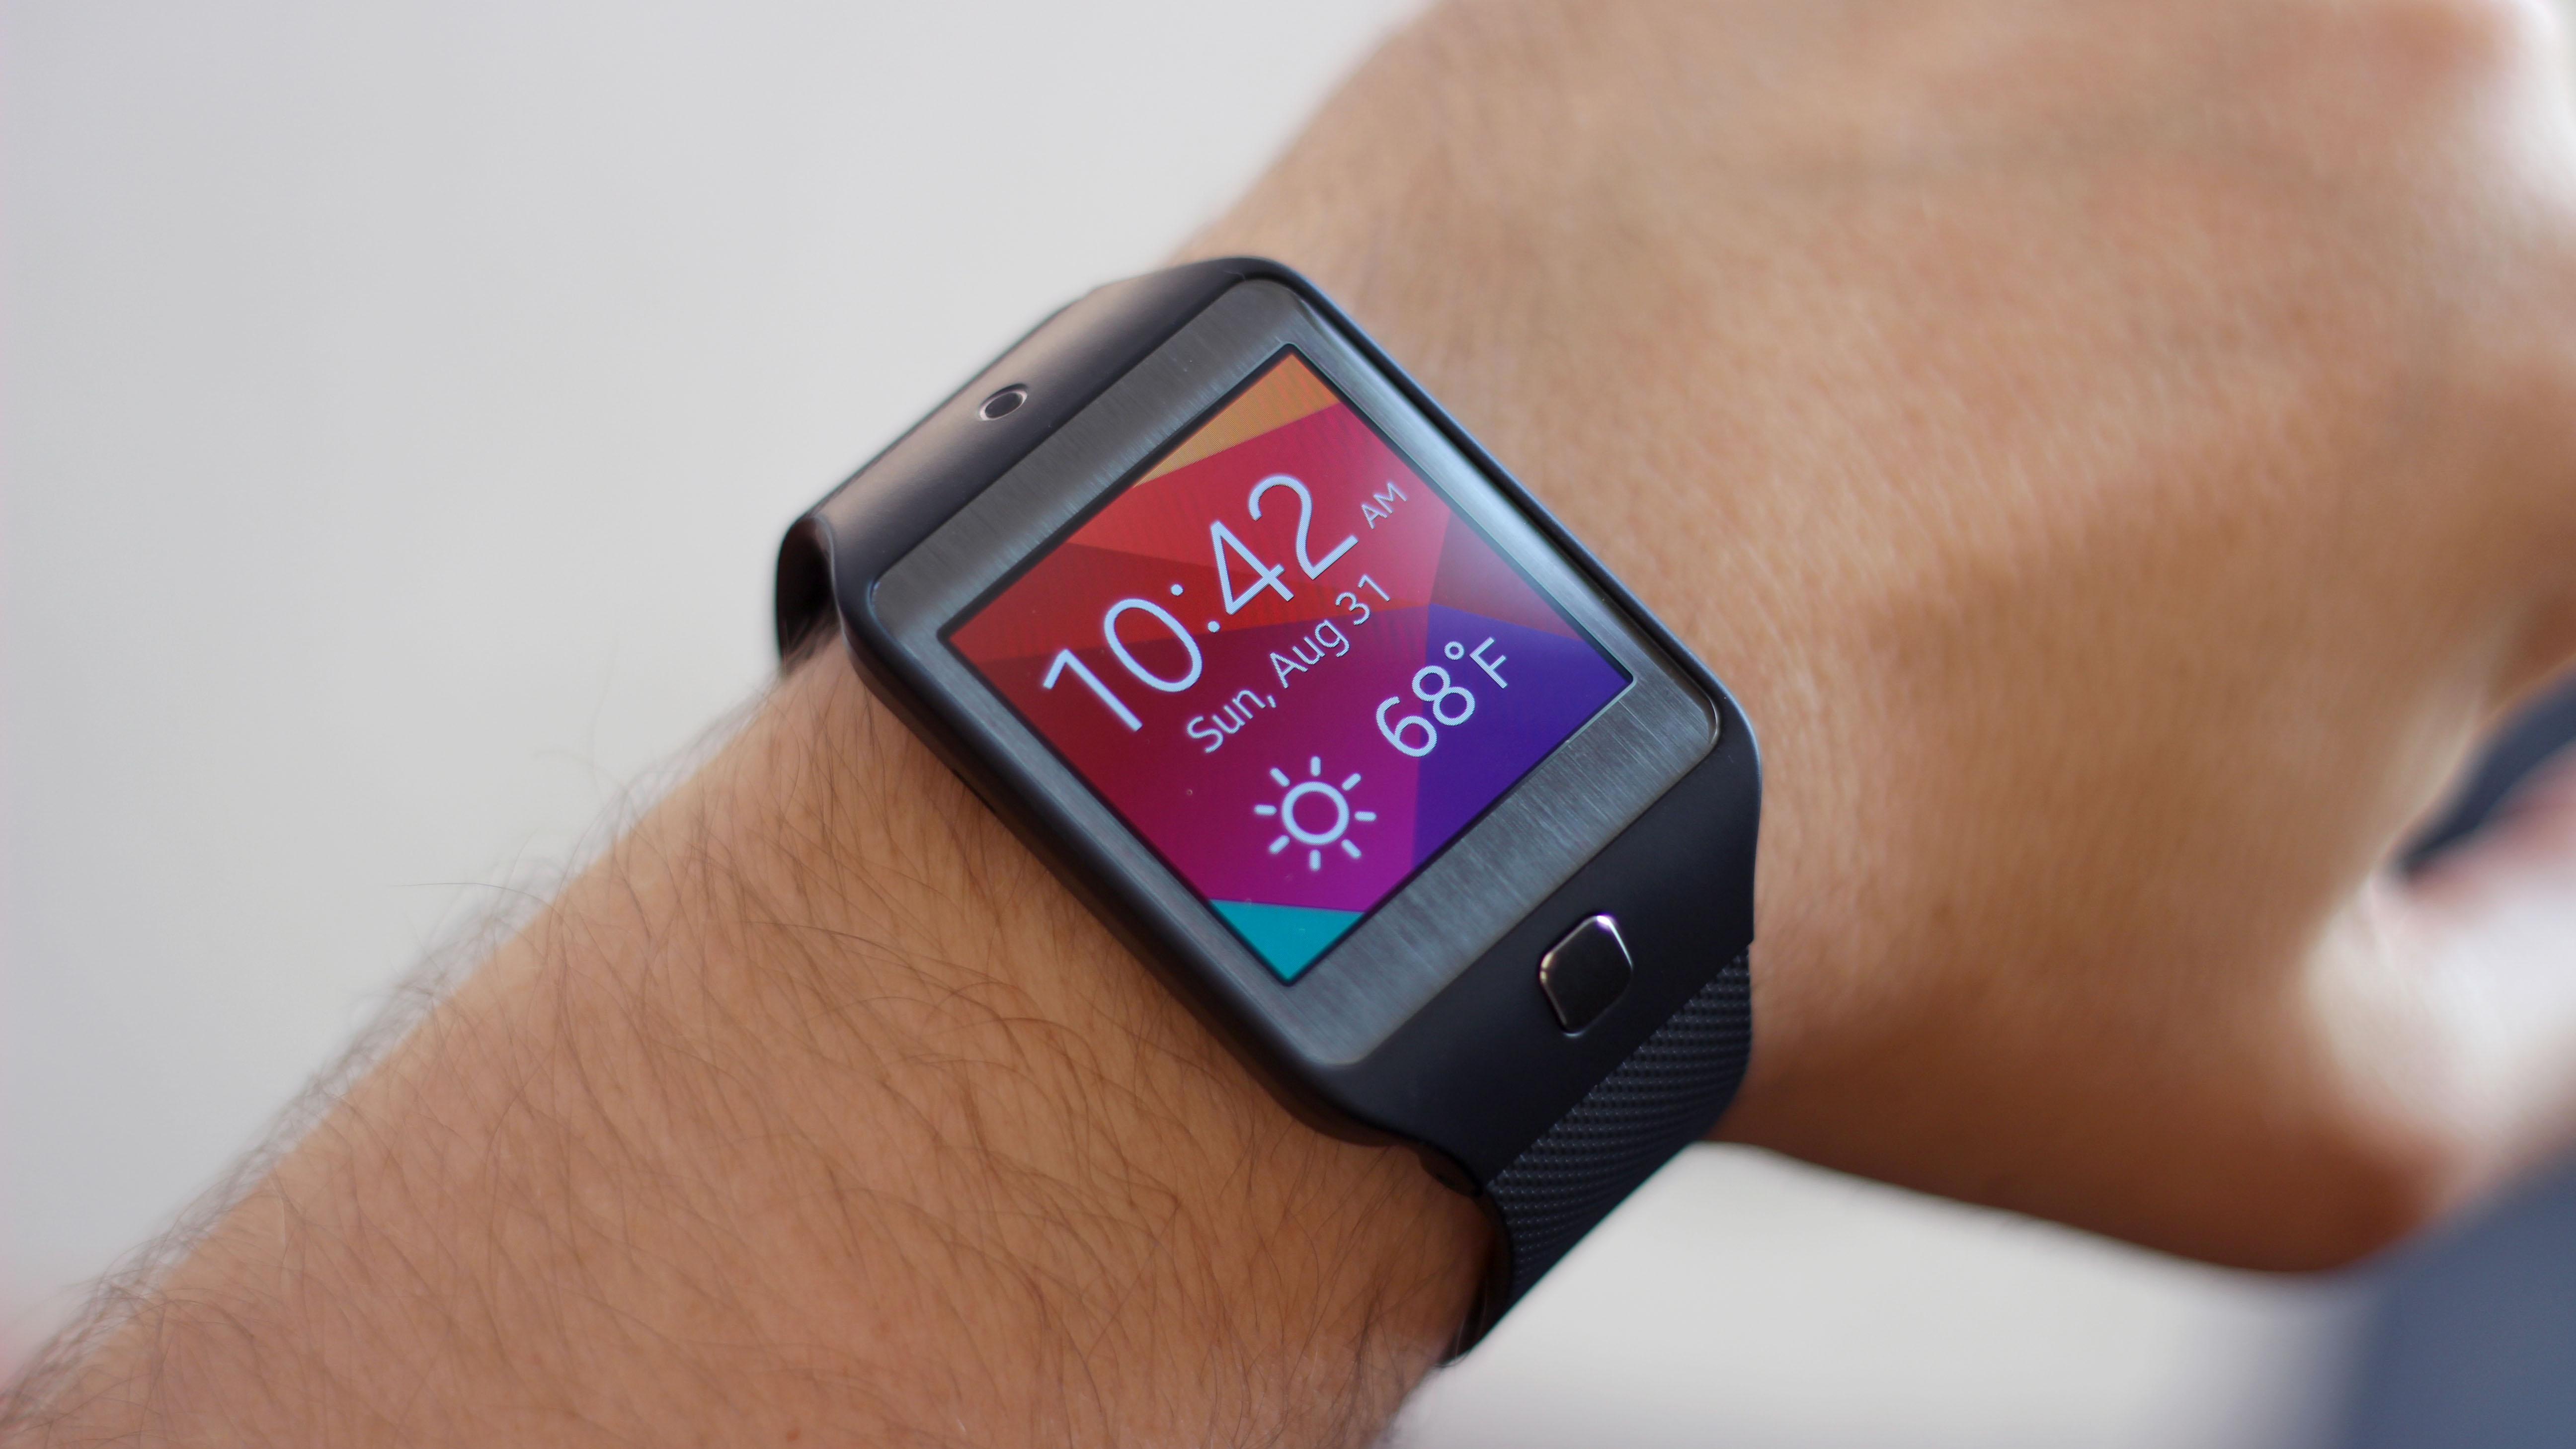 Review: Samsung Gear 2 Neo smartwatch